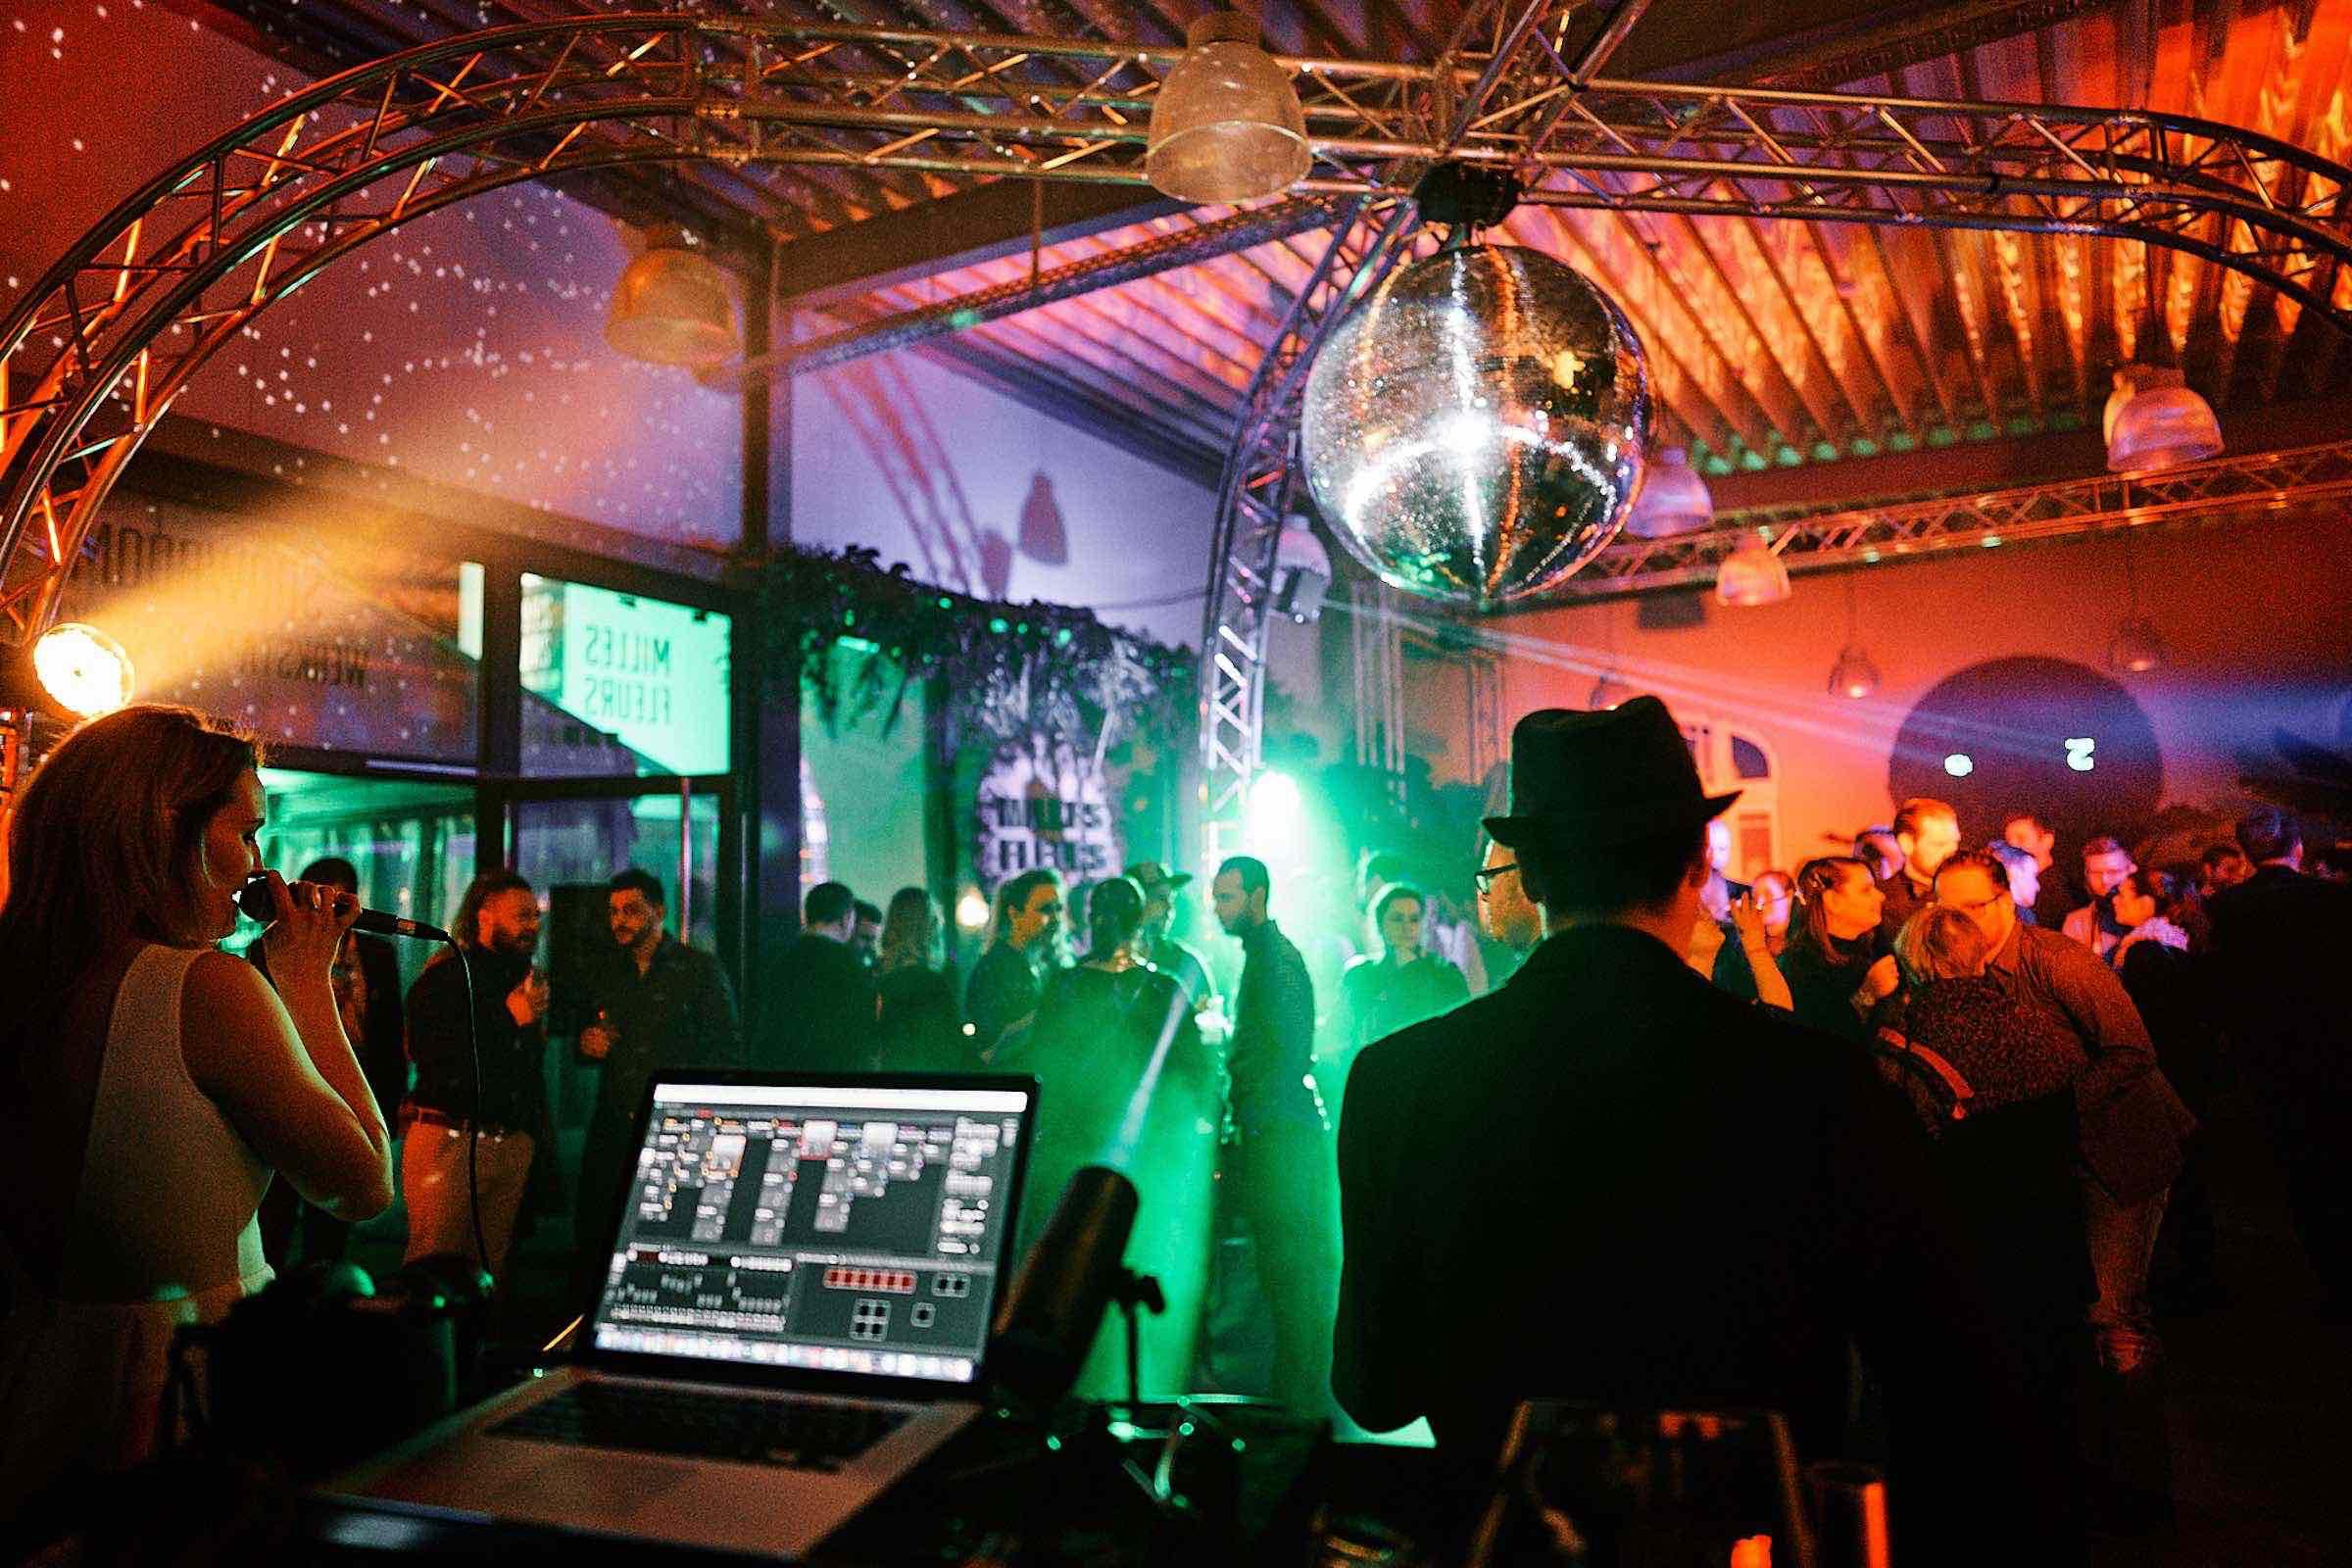 Band | Hamburg | Mieten | Liveband | Livemusik | Partyband | Lounge | Pop | Jazz | Sänger | Frontsänger | Johnny Tune | Hochzeit | Standesamt | Trauung | Messe | Firmenfeier | Charity | Buchen | Hamburgfeiert